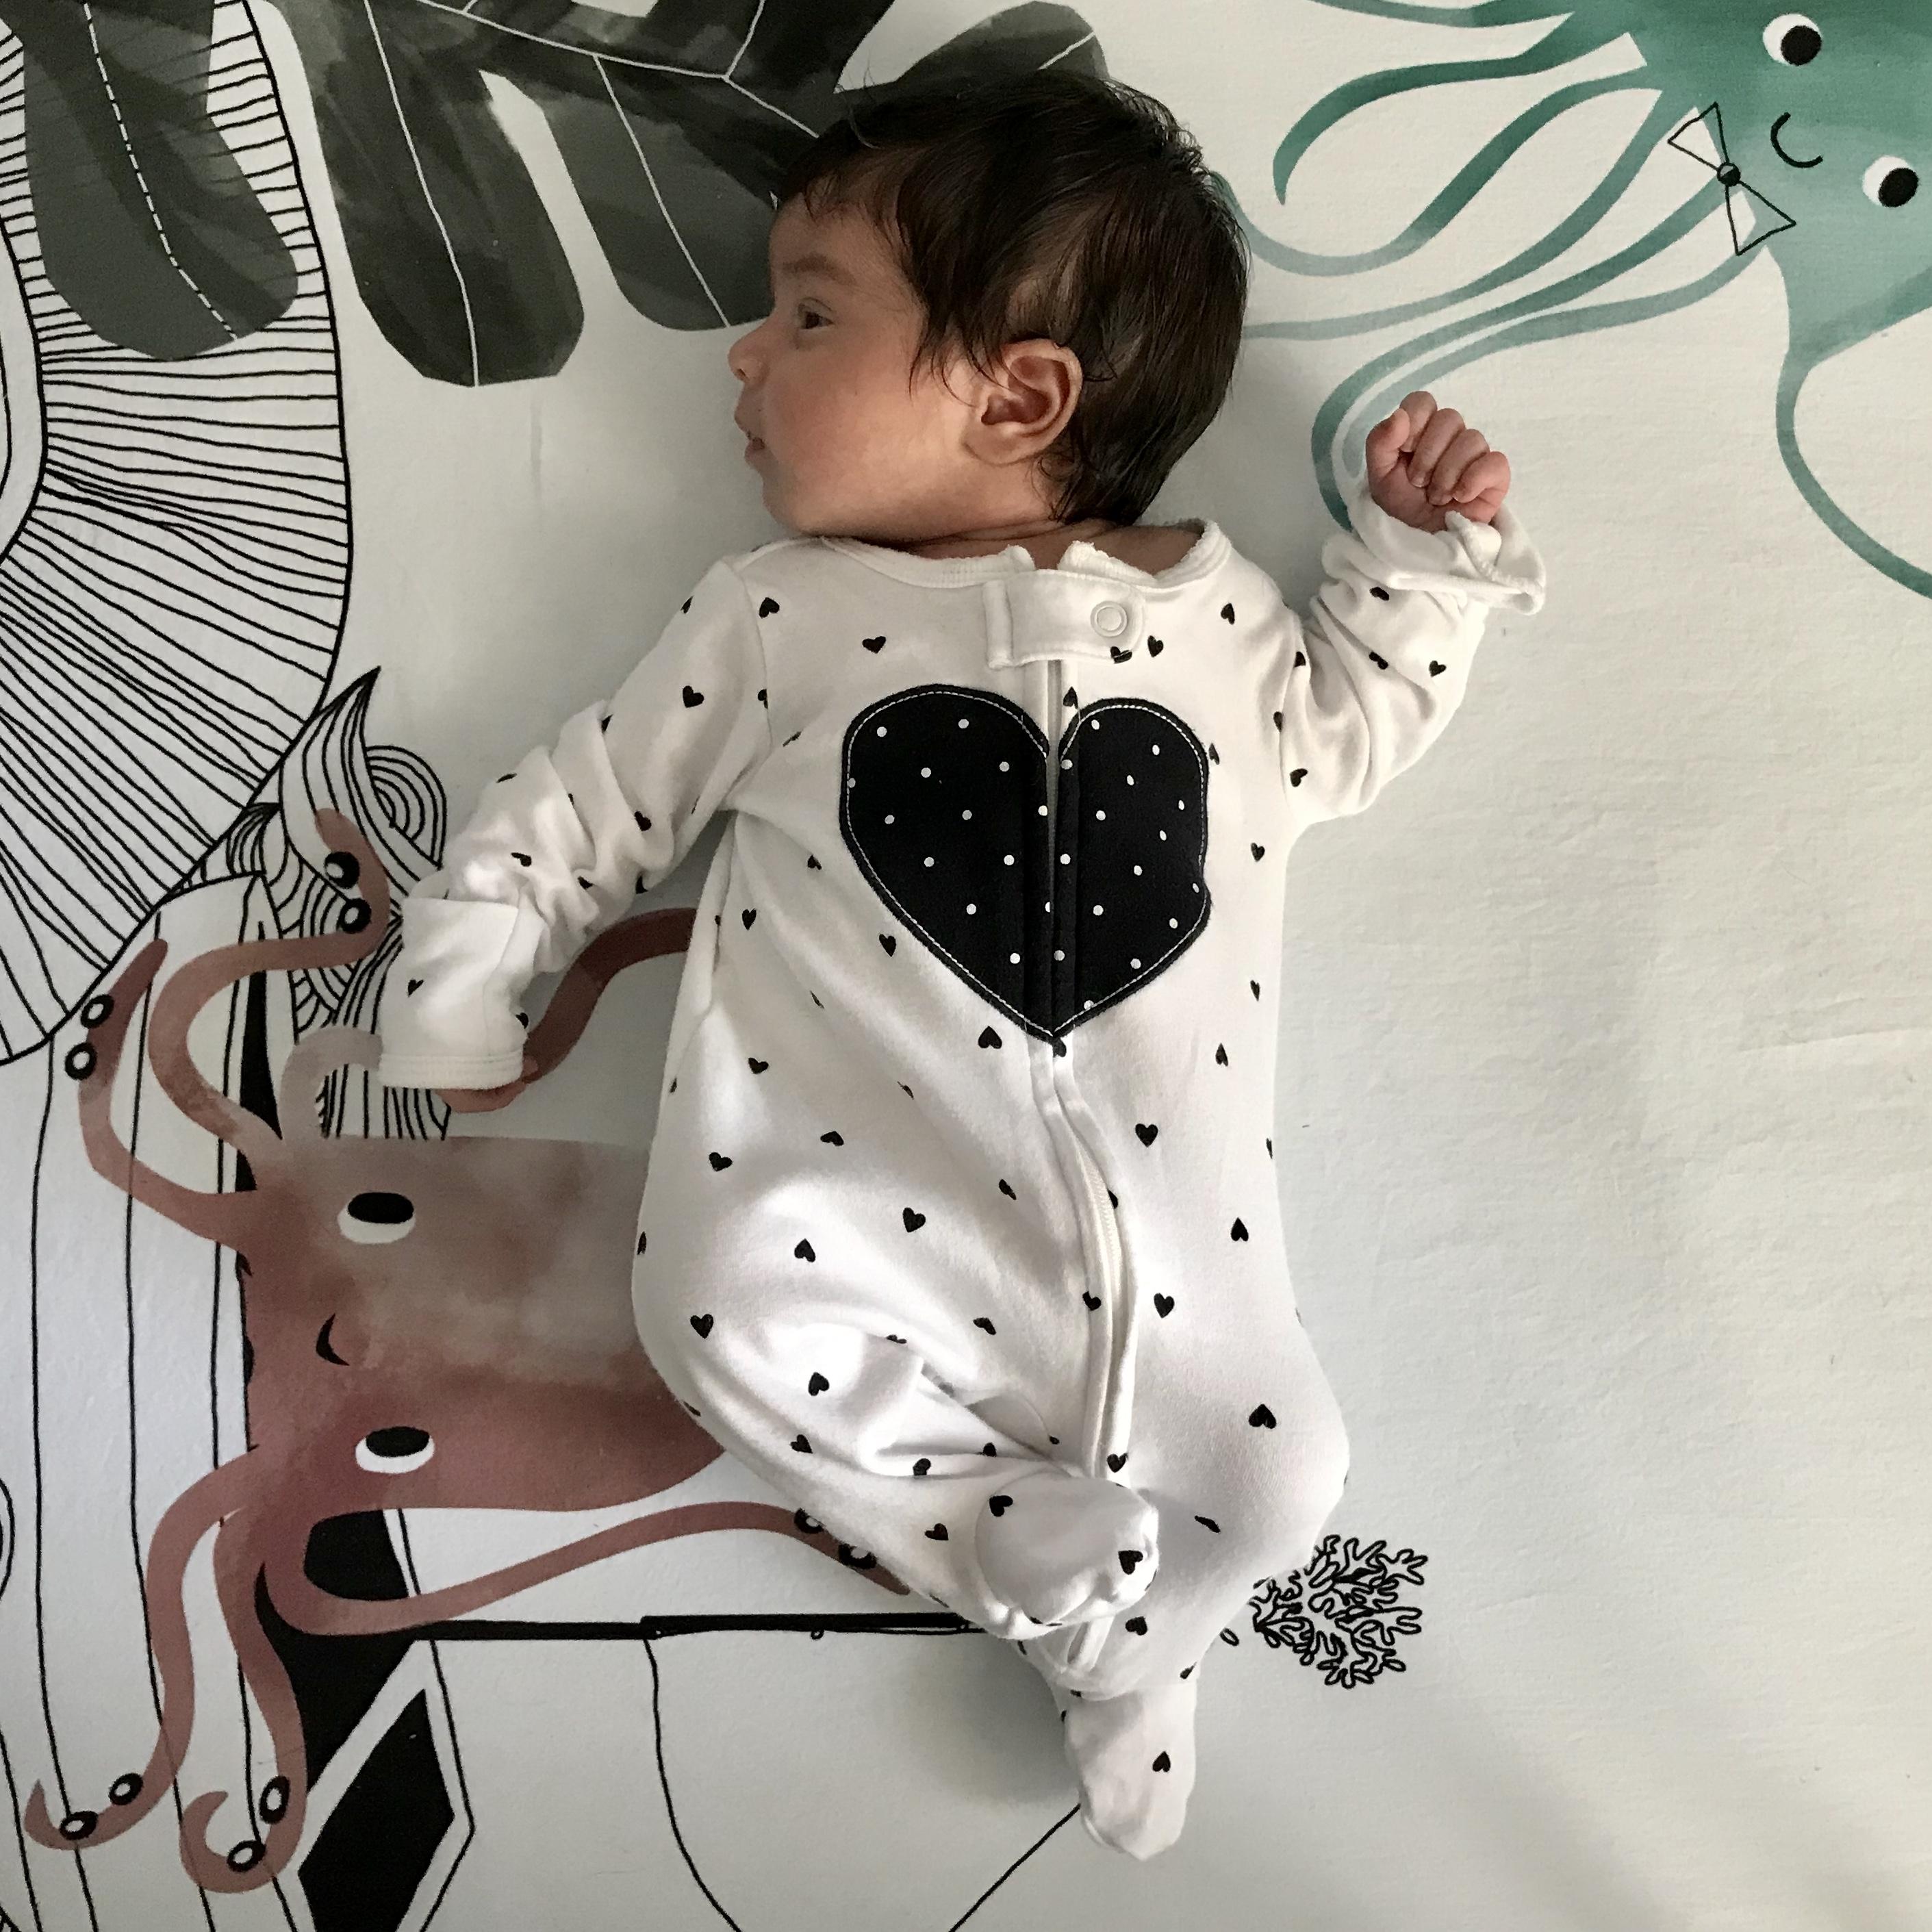 Baby Zoya one week after birth